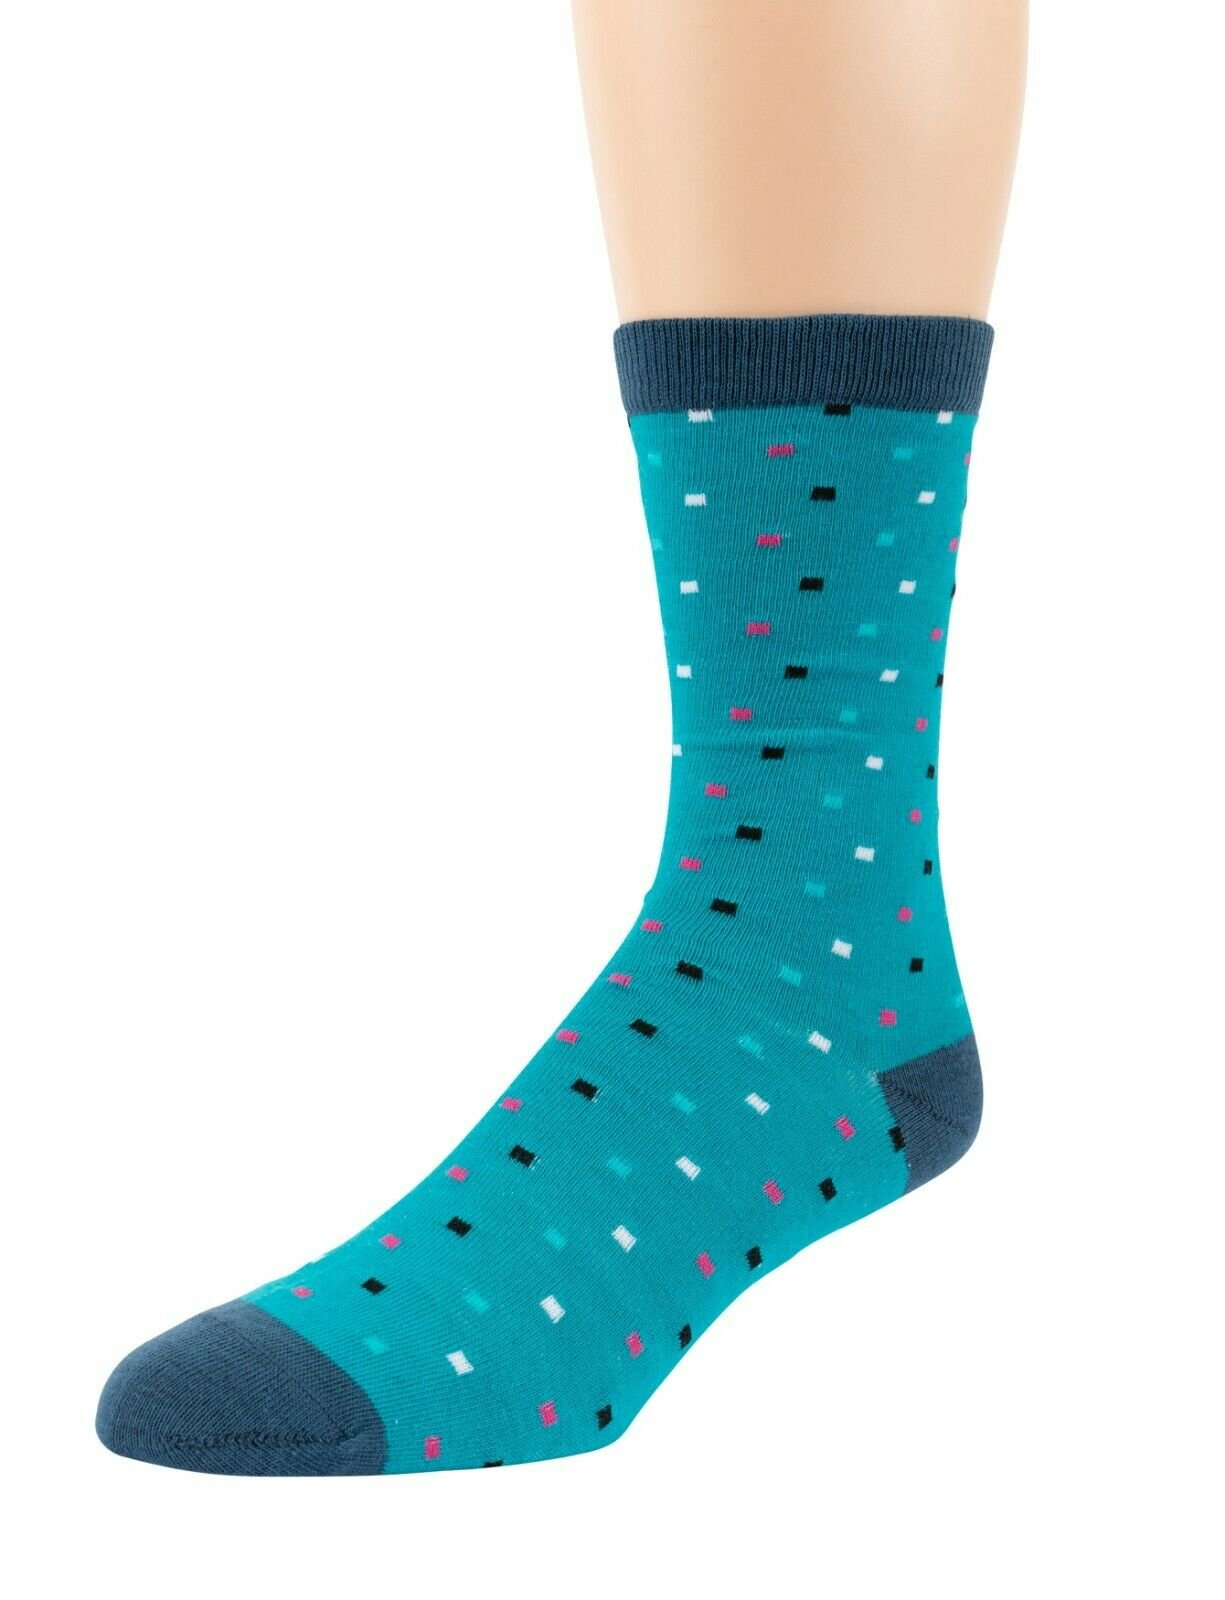 Mitch-Bogen-Mens-Cotton-Dress-Socks-Colorful-Fashion-Crew-Socks-8-Pack-Gift-Box thumbnail 36